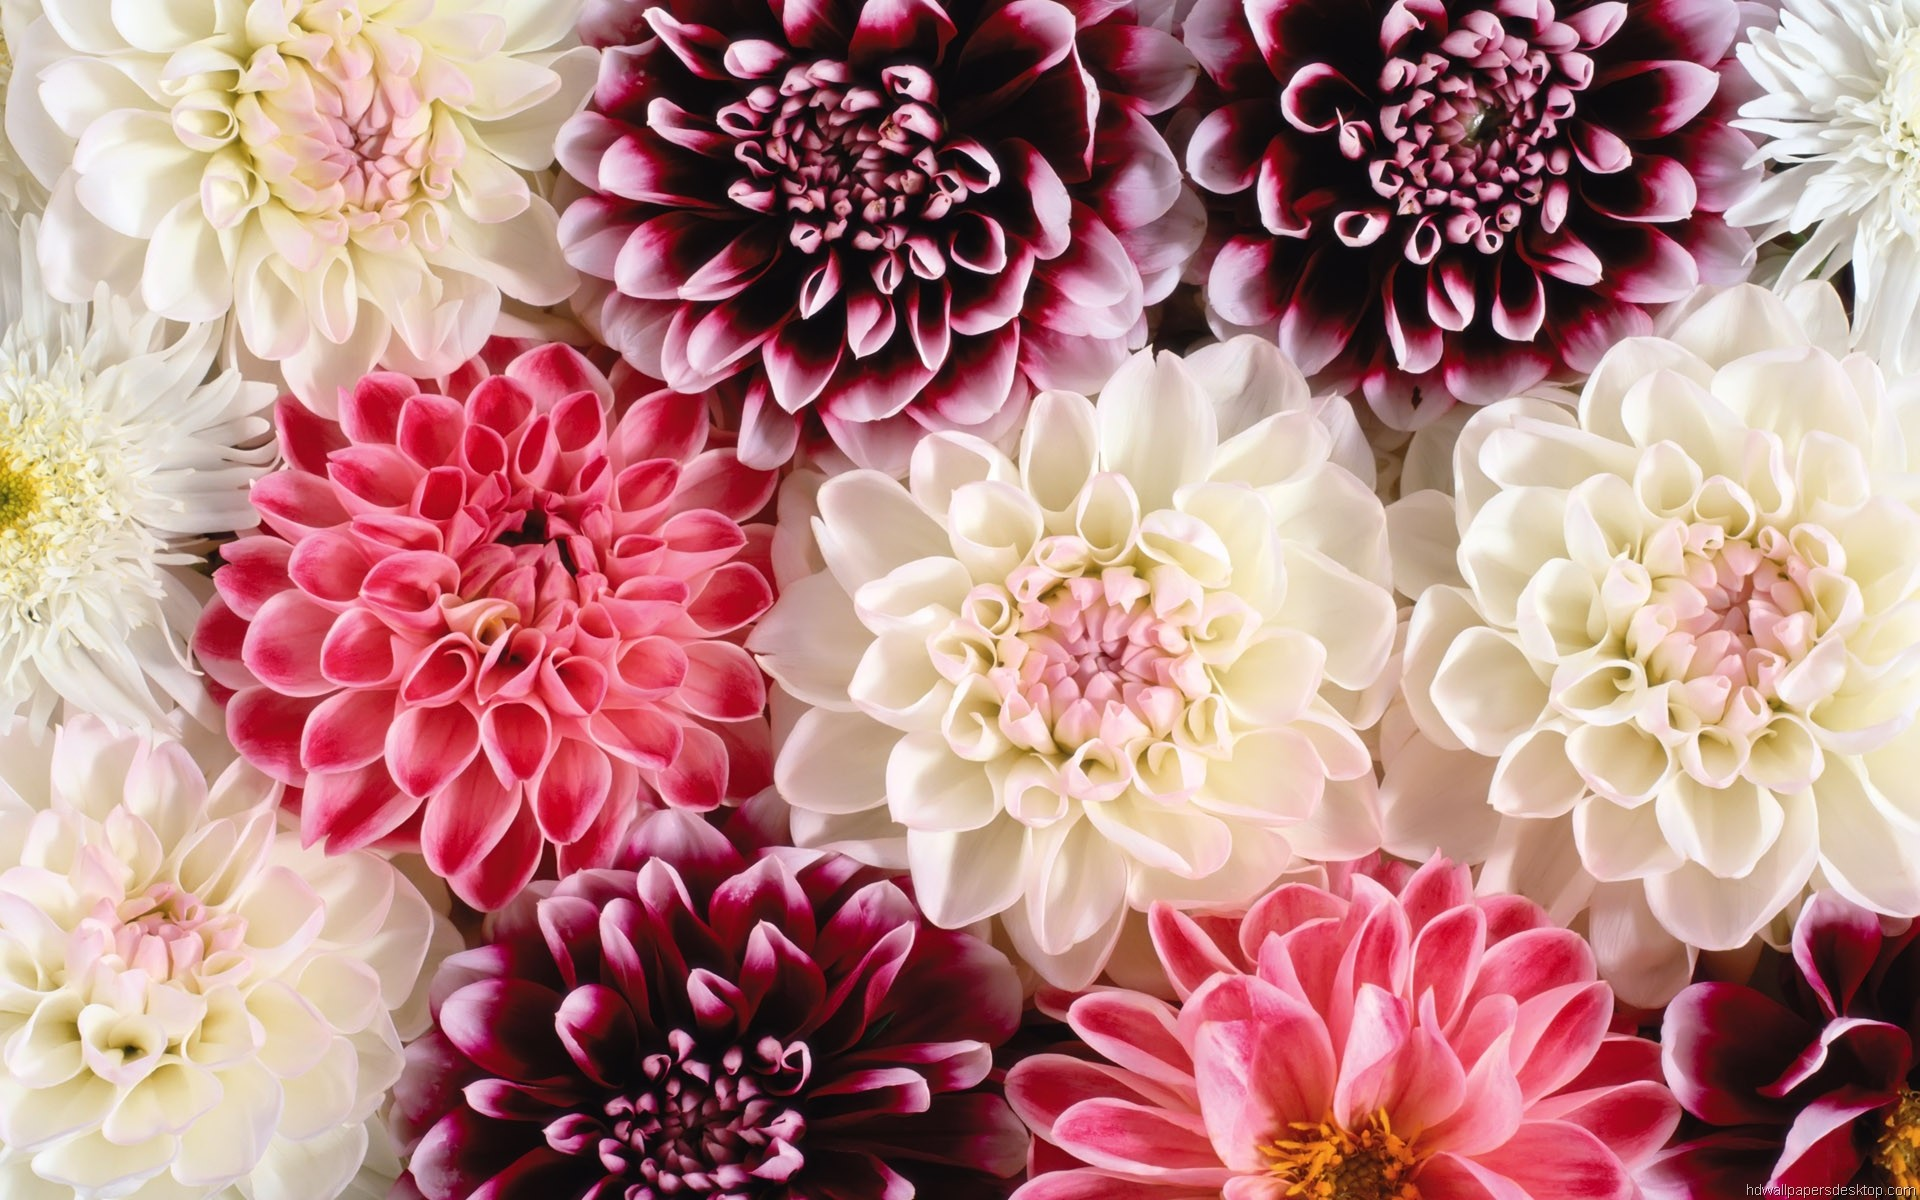 Pink Iphone 6 Wallpaper Floral Desktop Wallpaper 183 ① Download Free Cool Full Hd